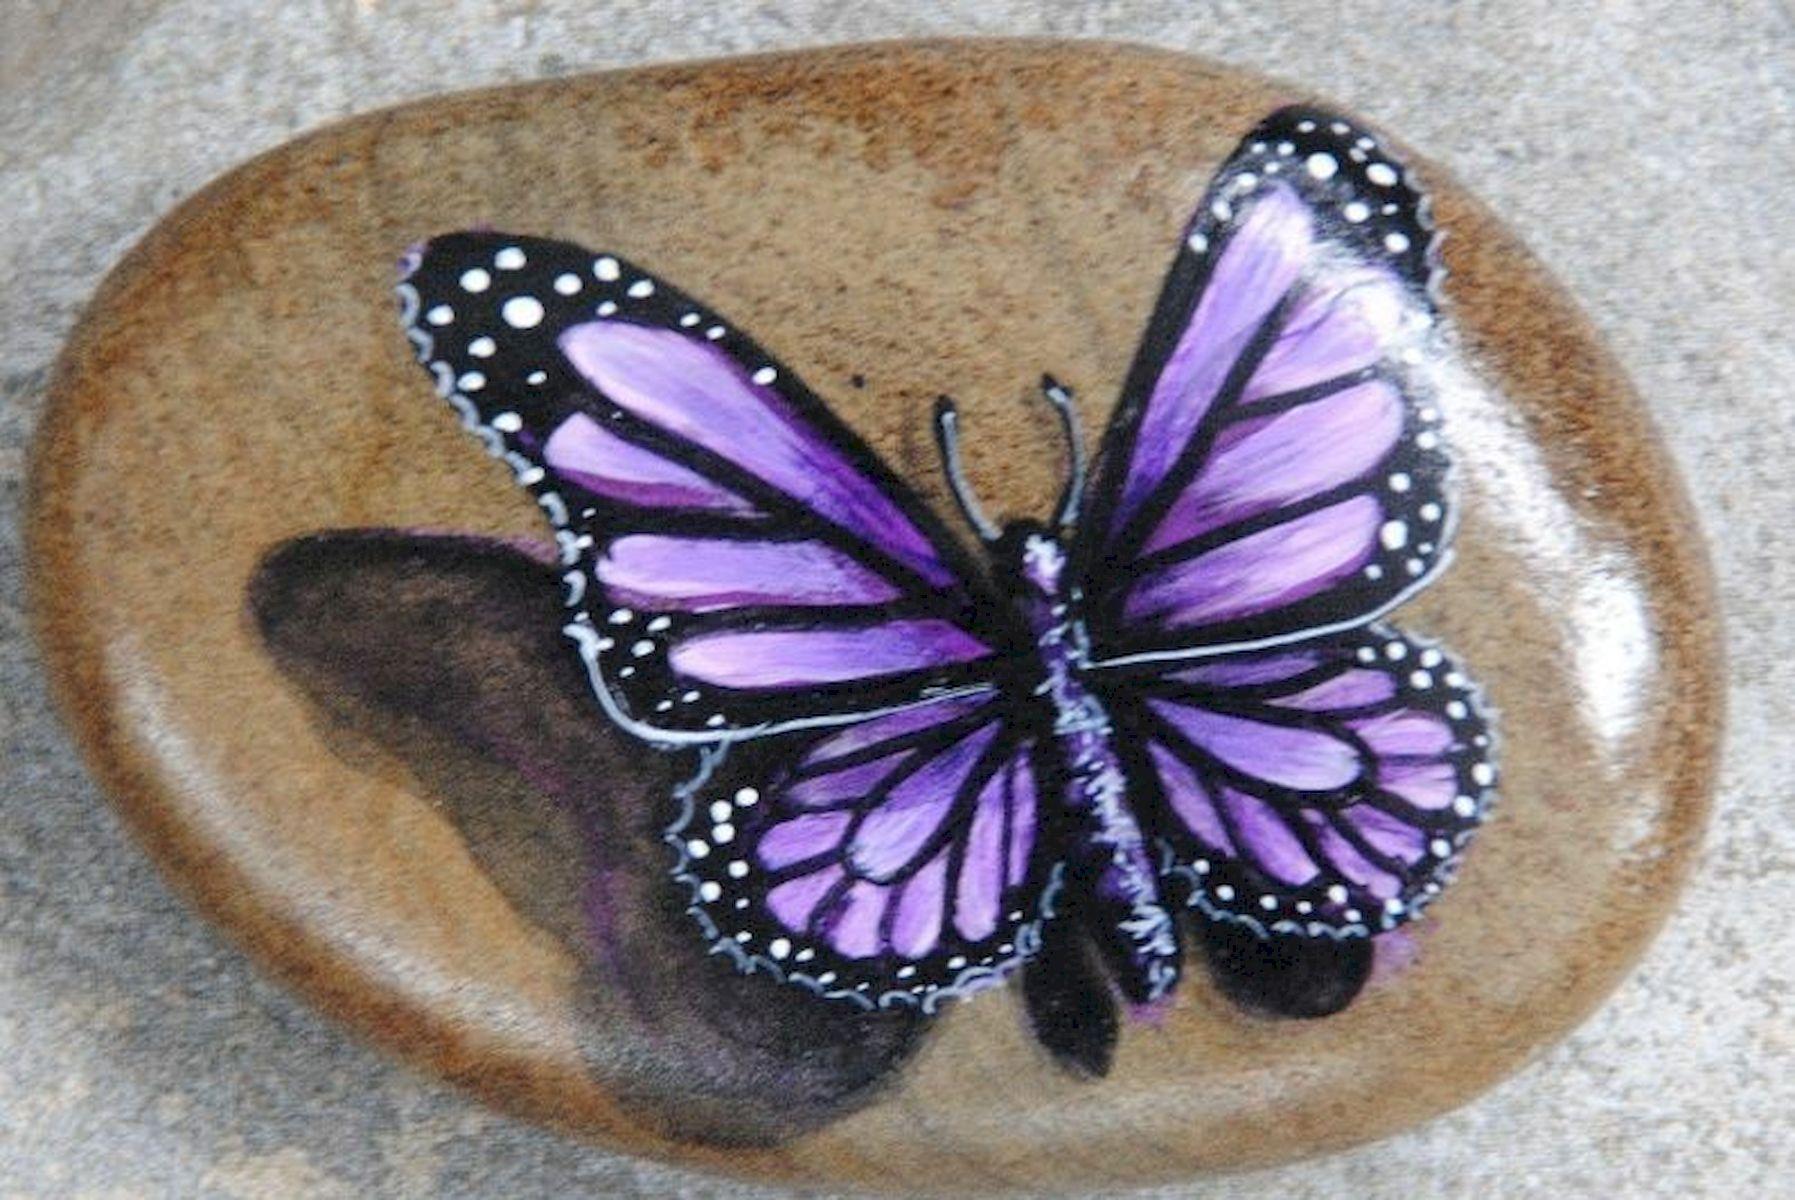 55 Cute DIY Painted Rocks Animals Butterfly Ideas (10)